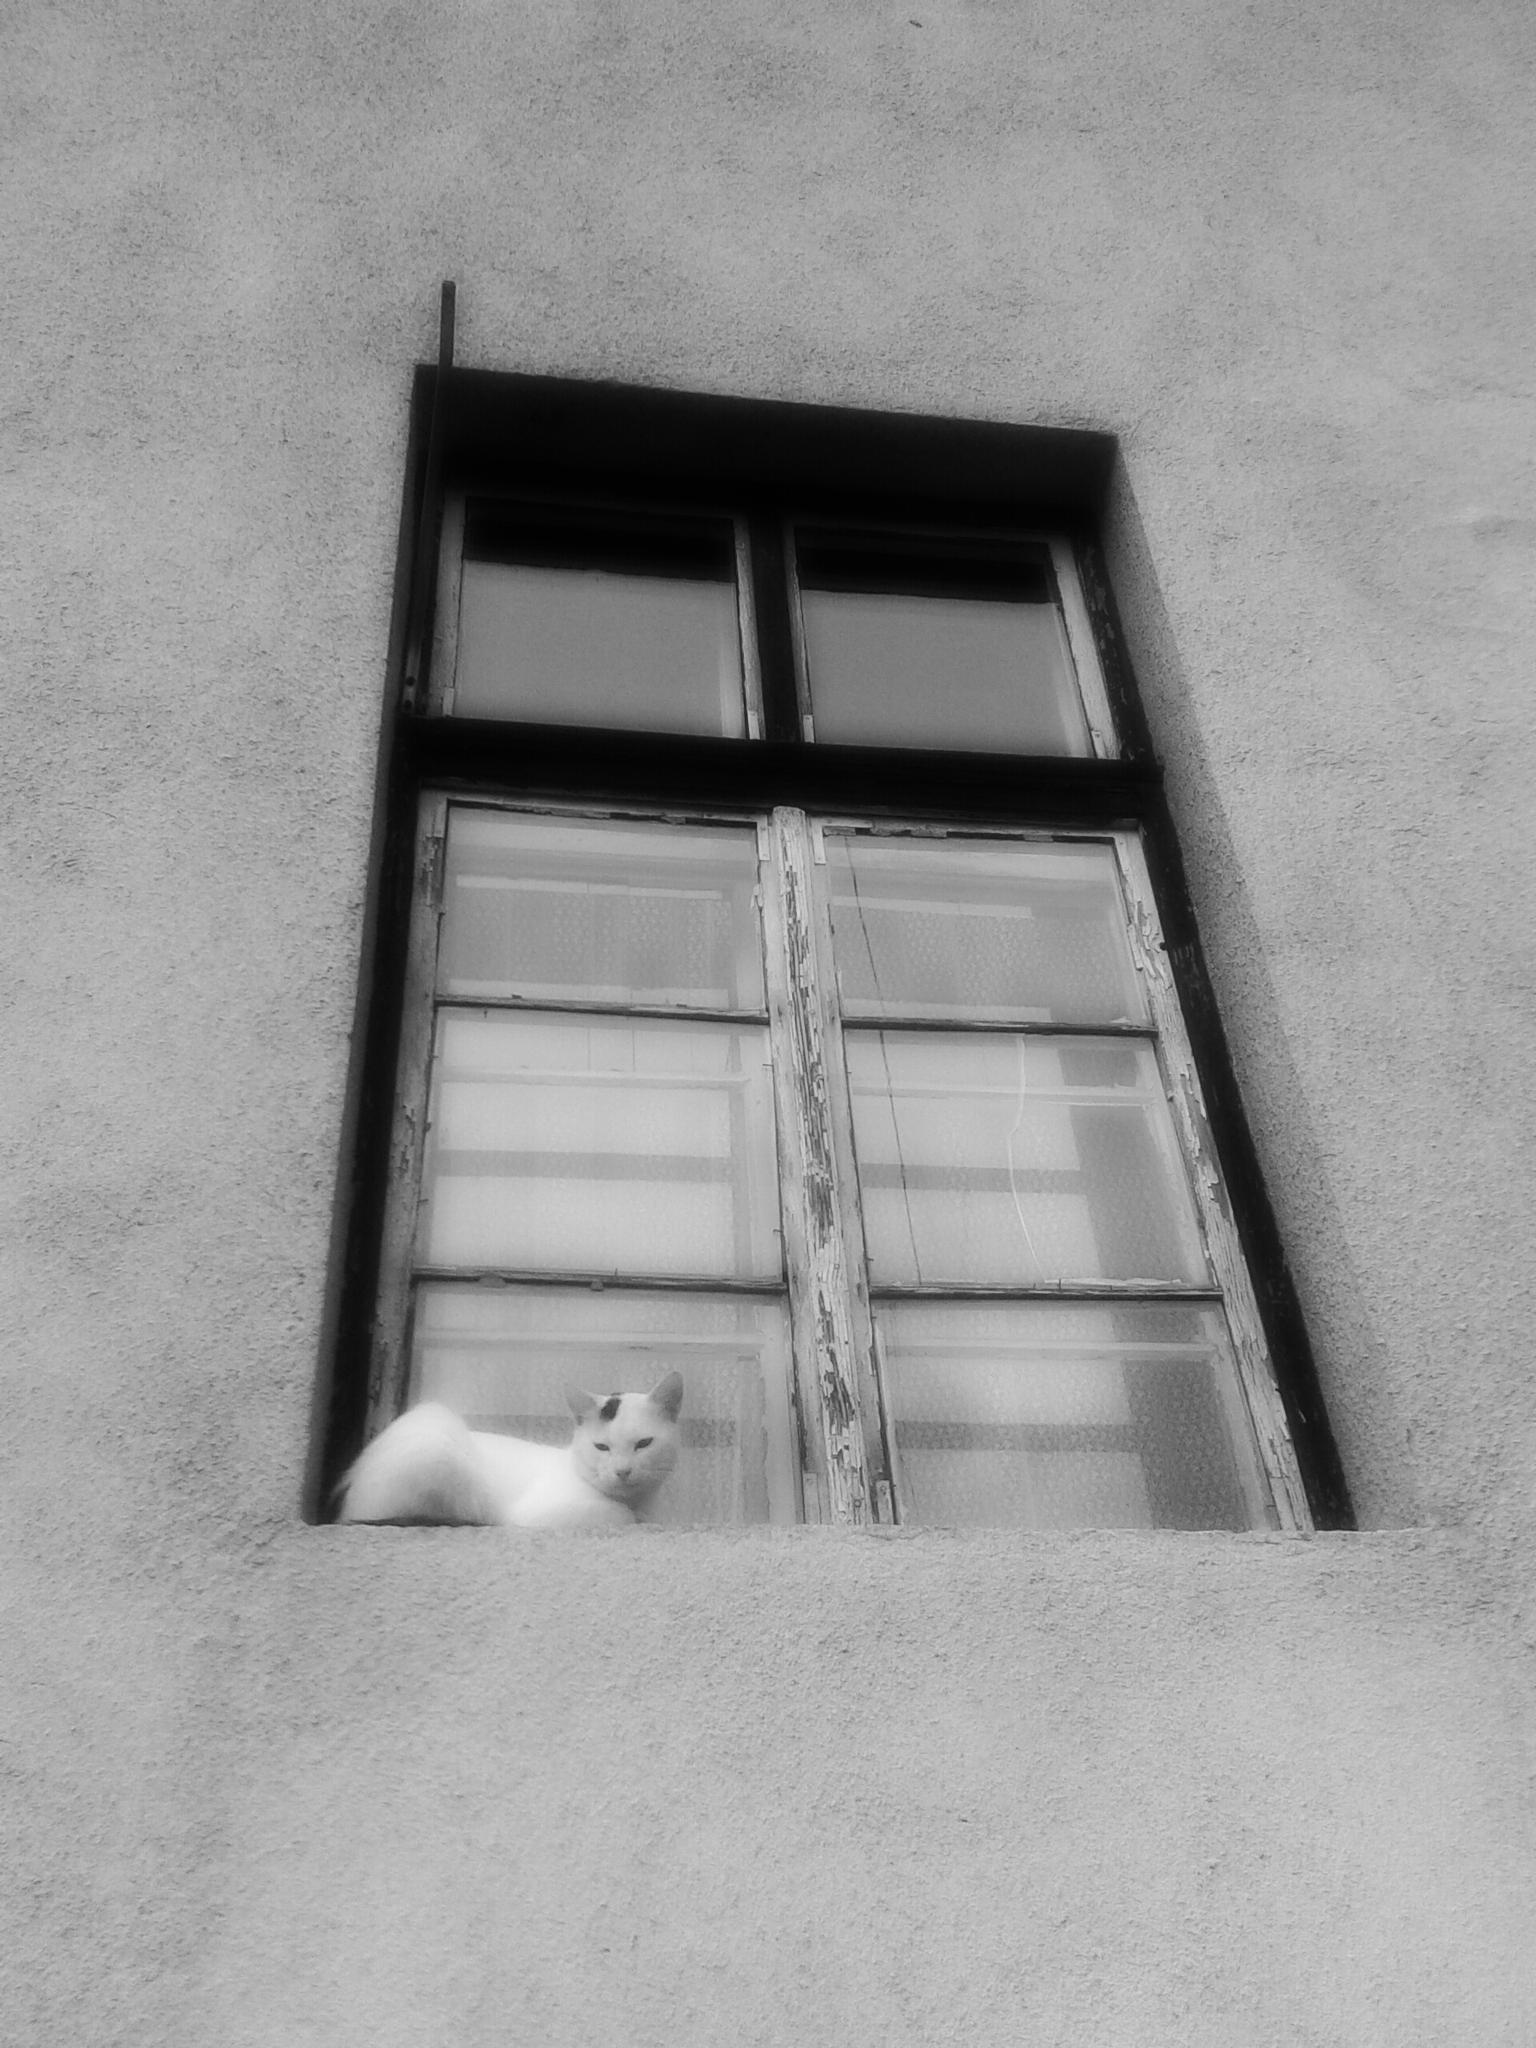 Untitled by slavko.pjevcevic